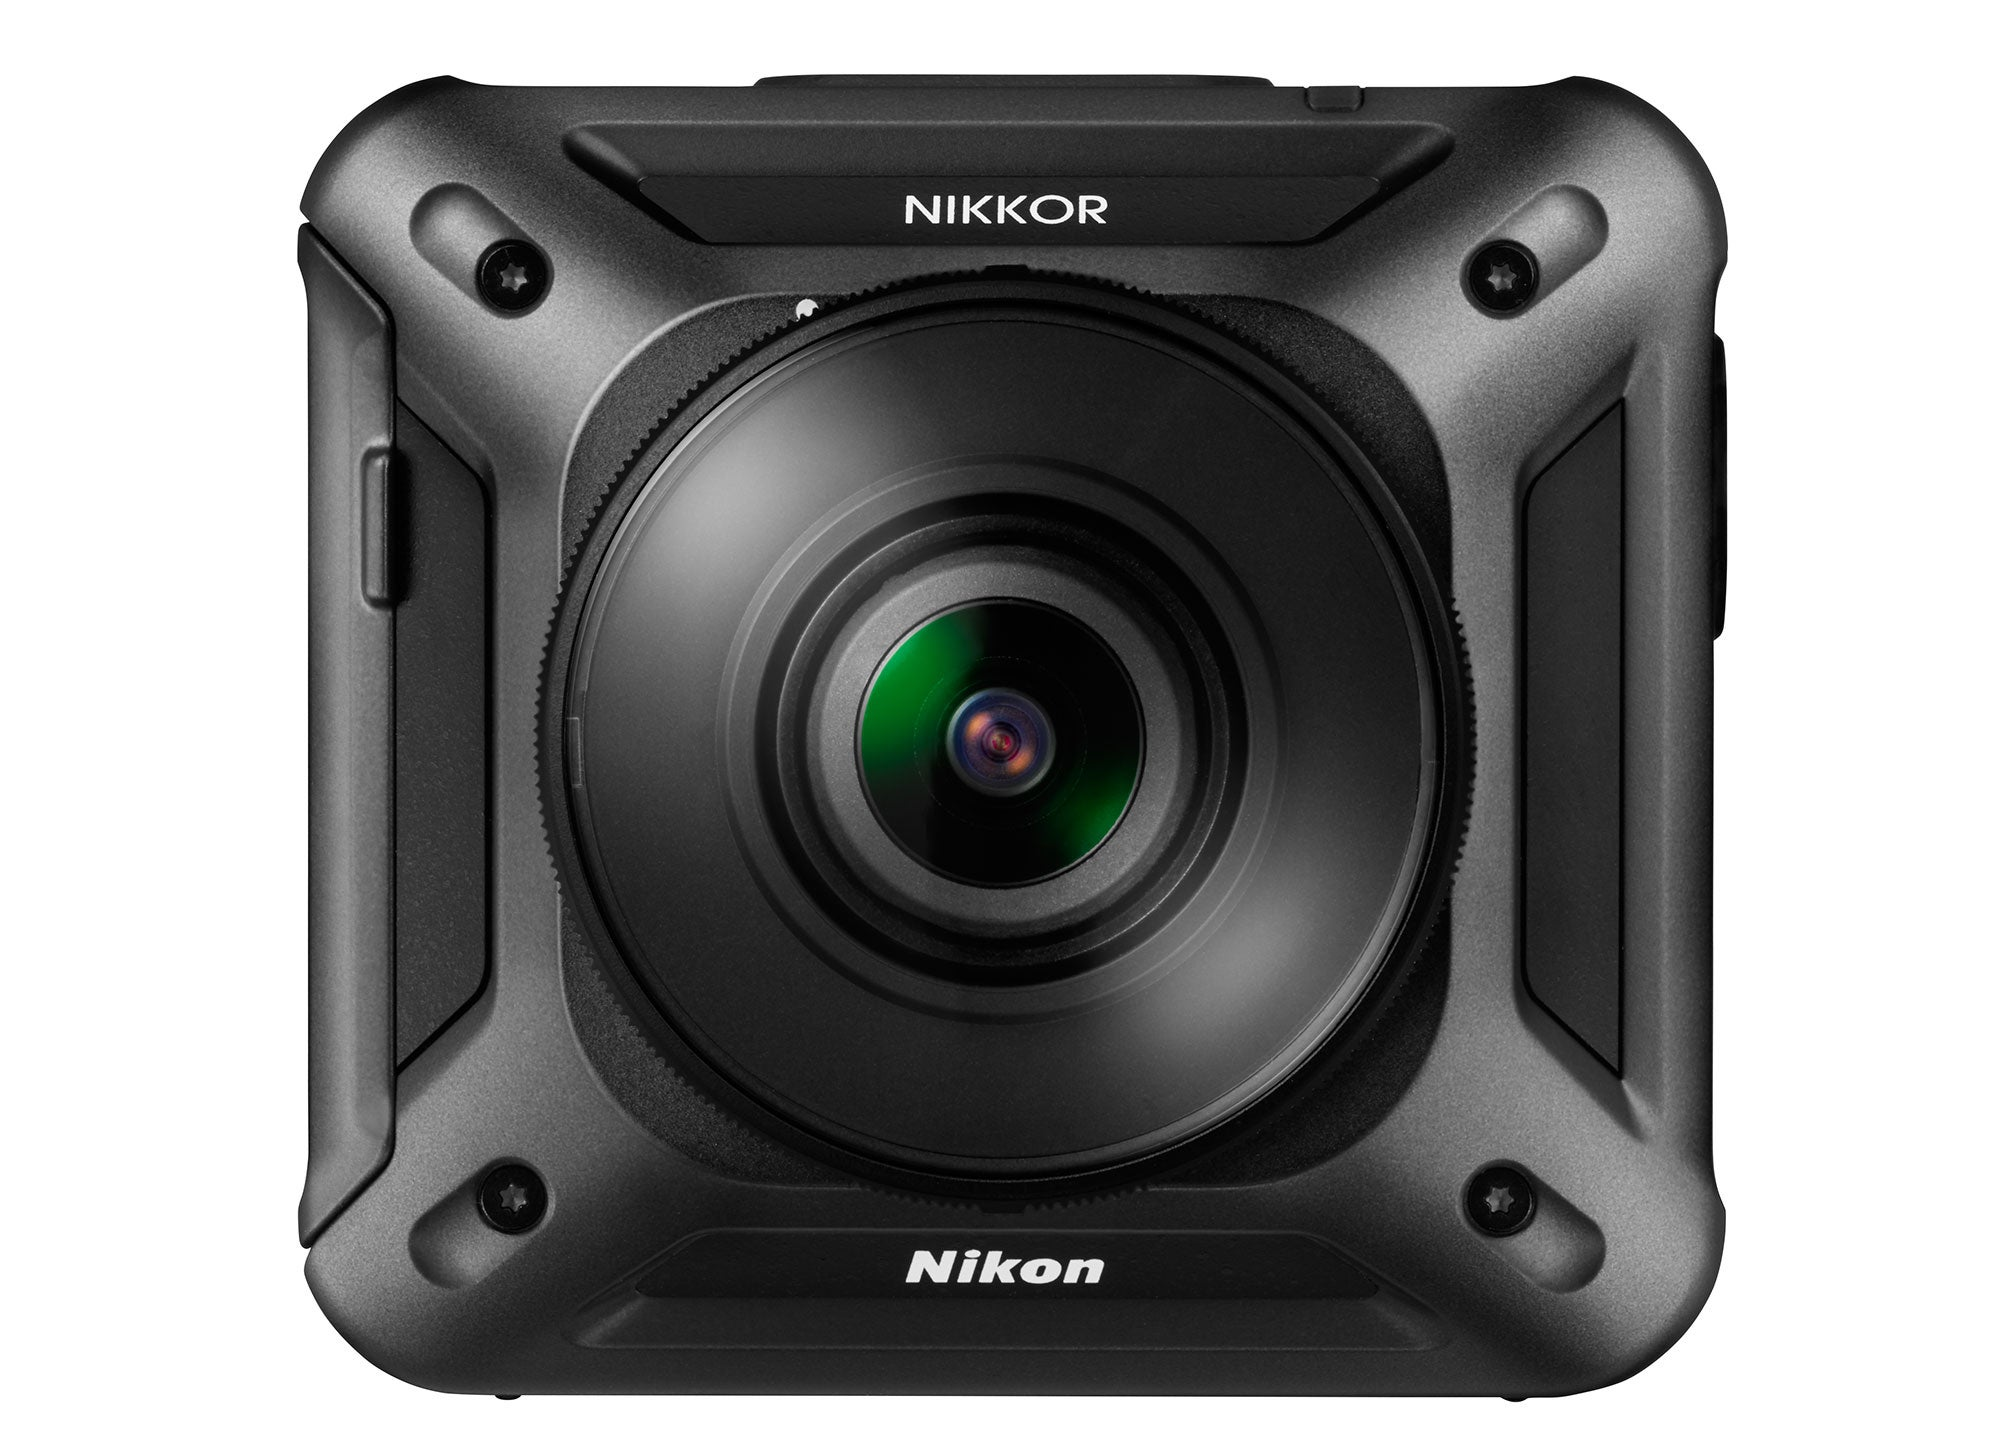 Nikon KeyMission 360 Camera CES 2016